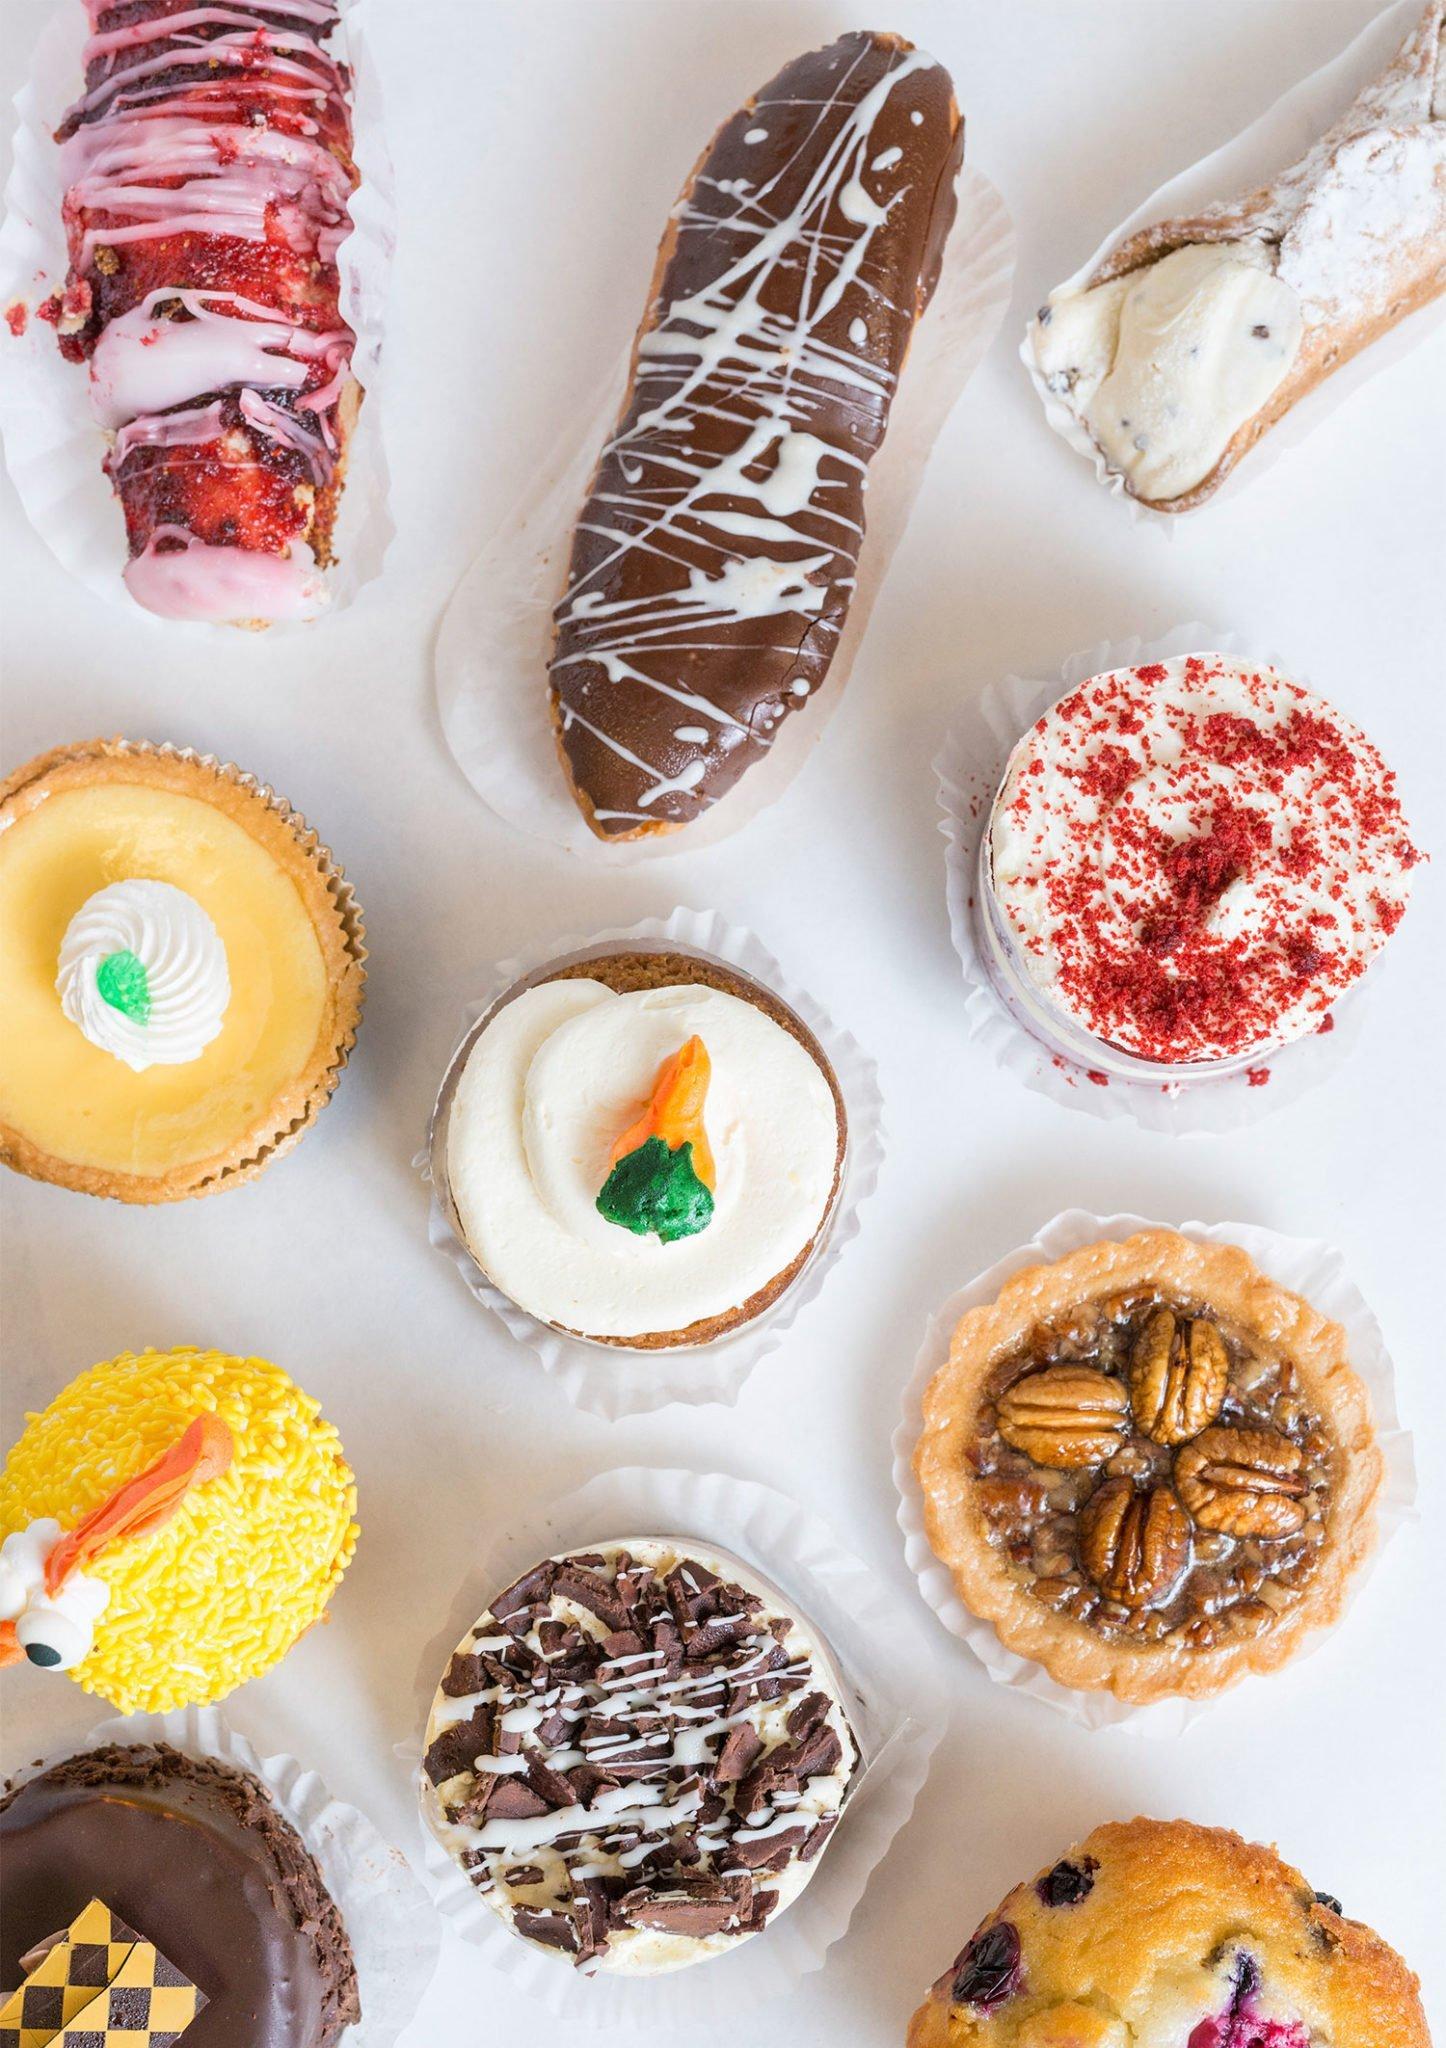 Bakery Items